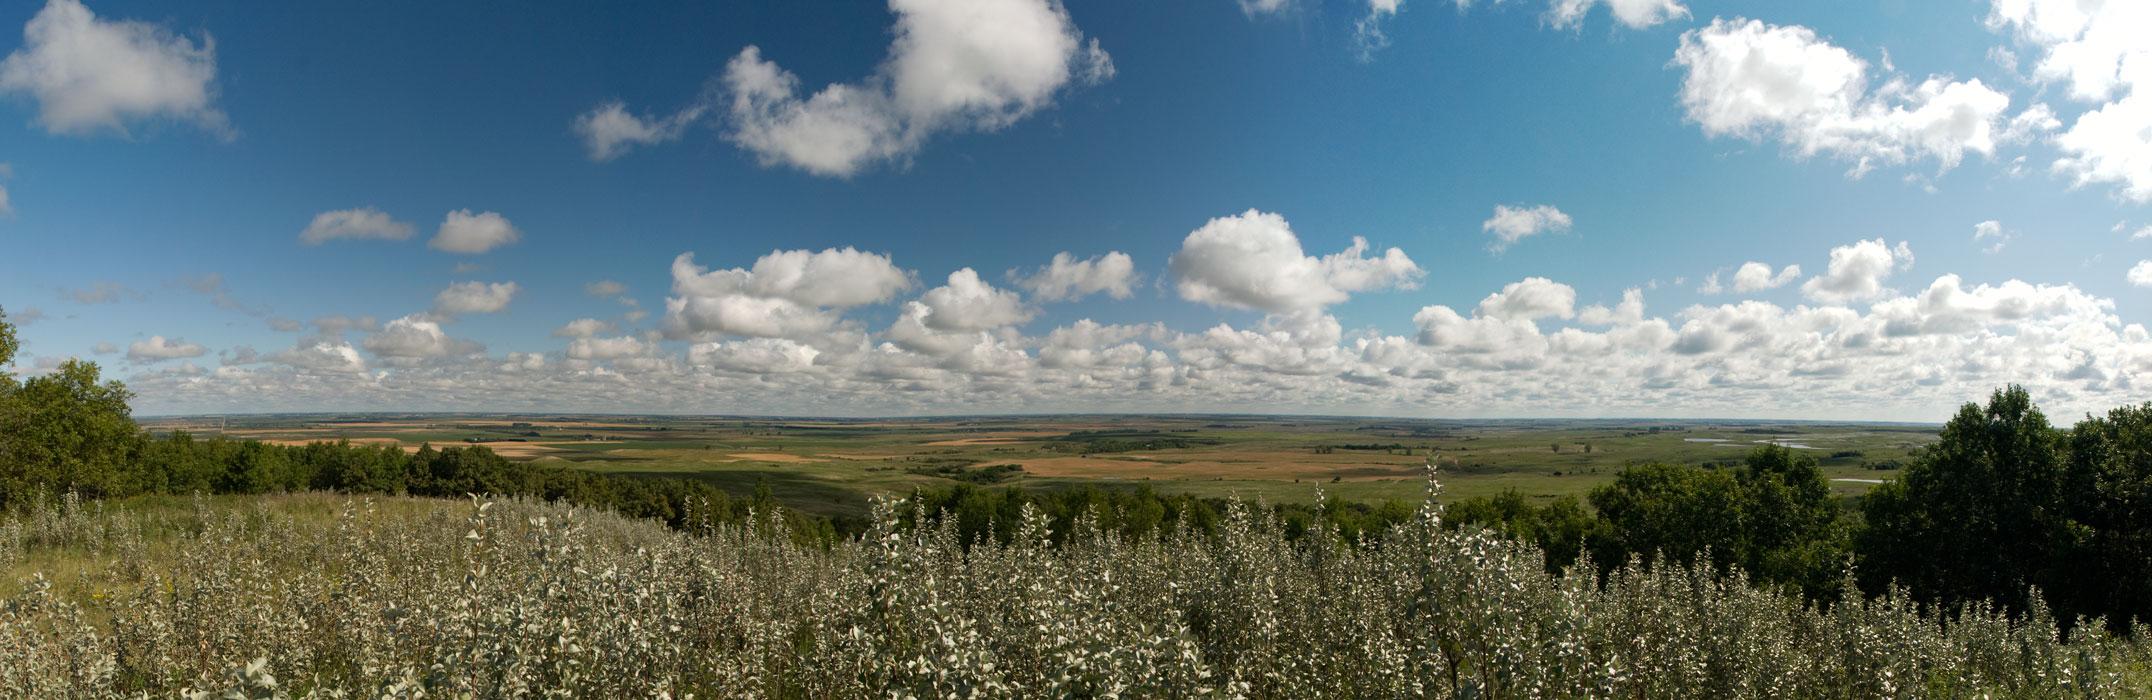 Eastern North Dakota Landscape